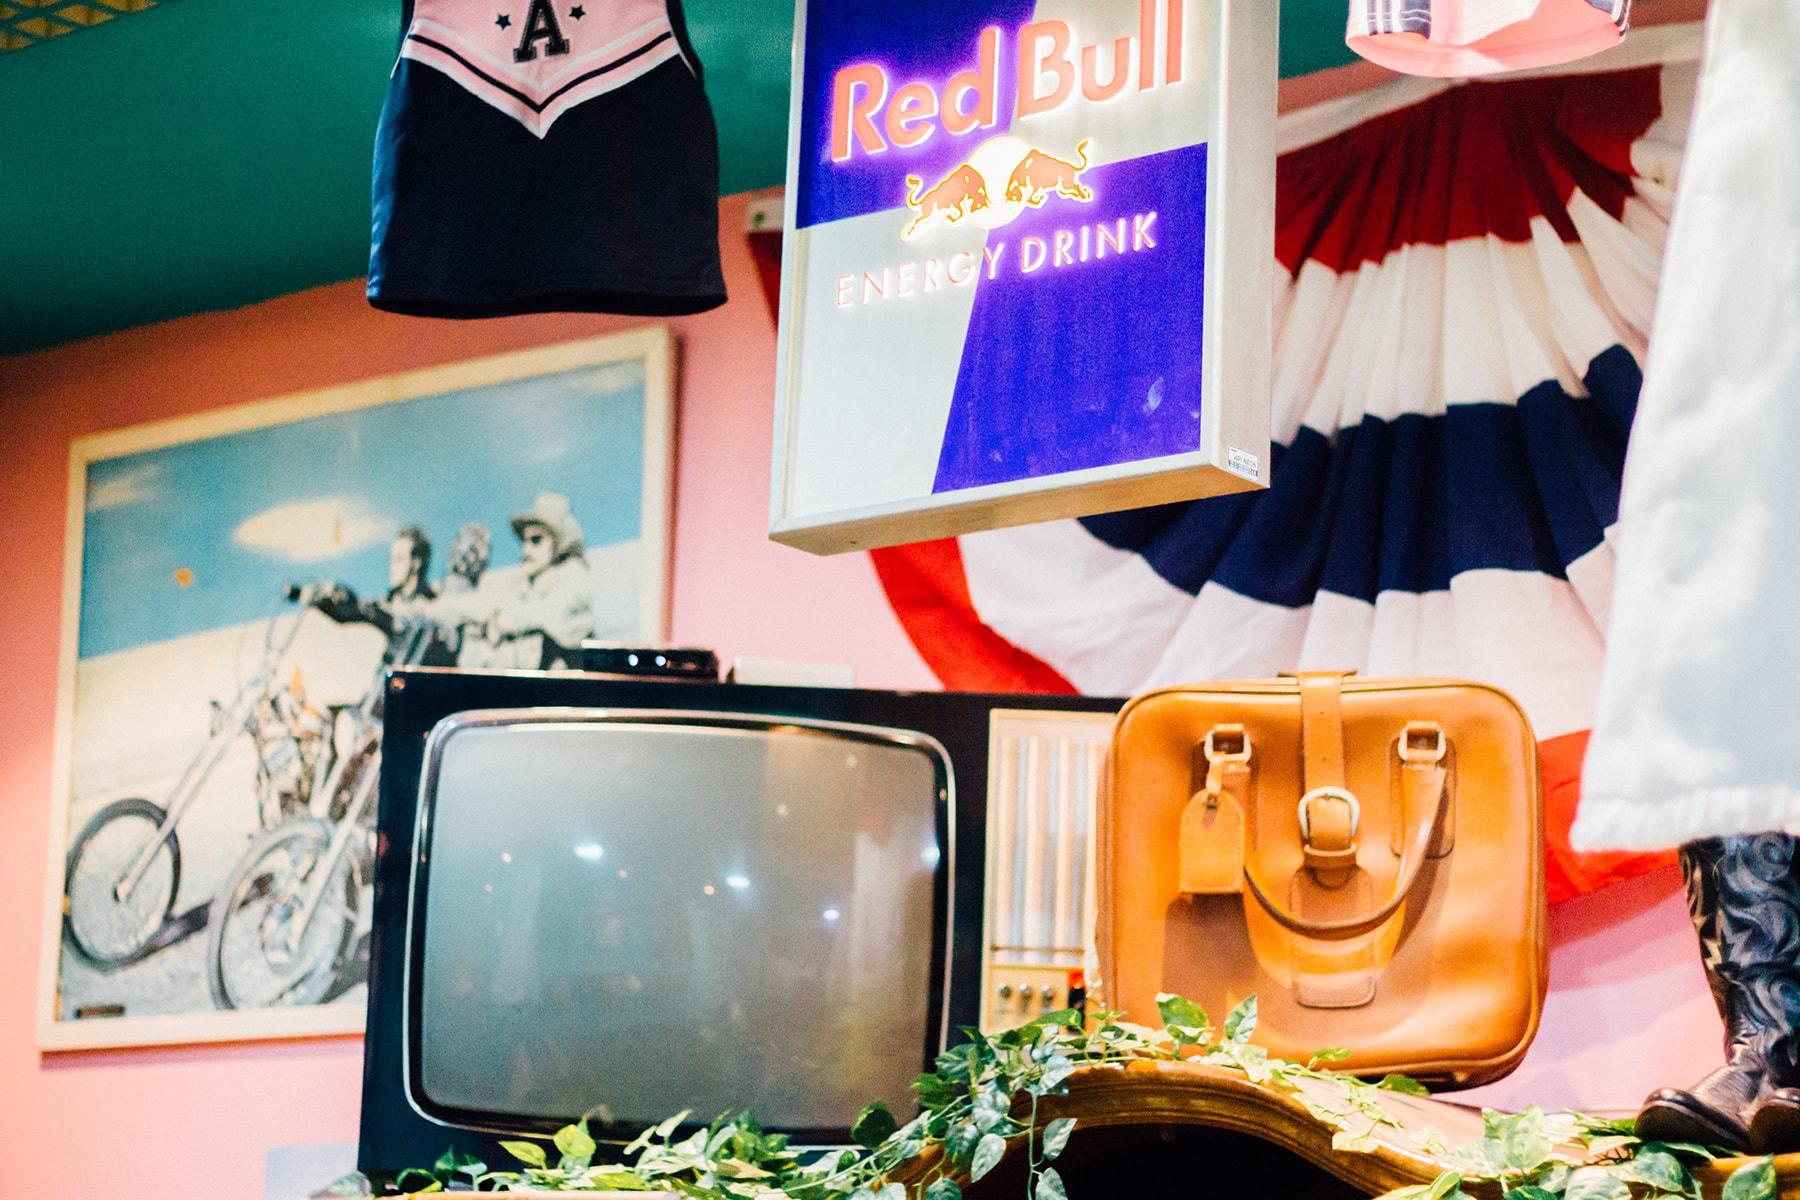 detalles televisor, maleta y ropa en cherry bomb